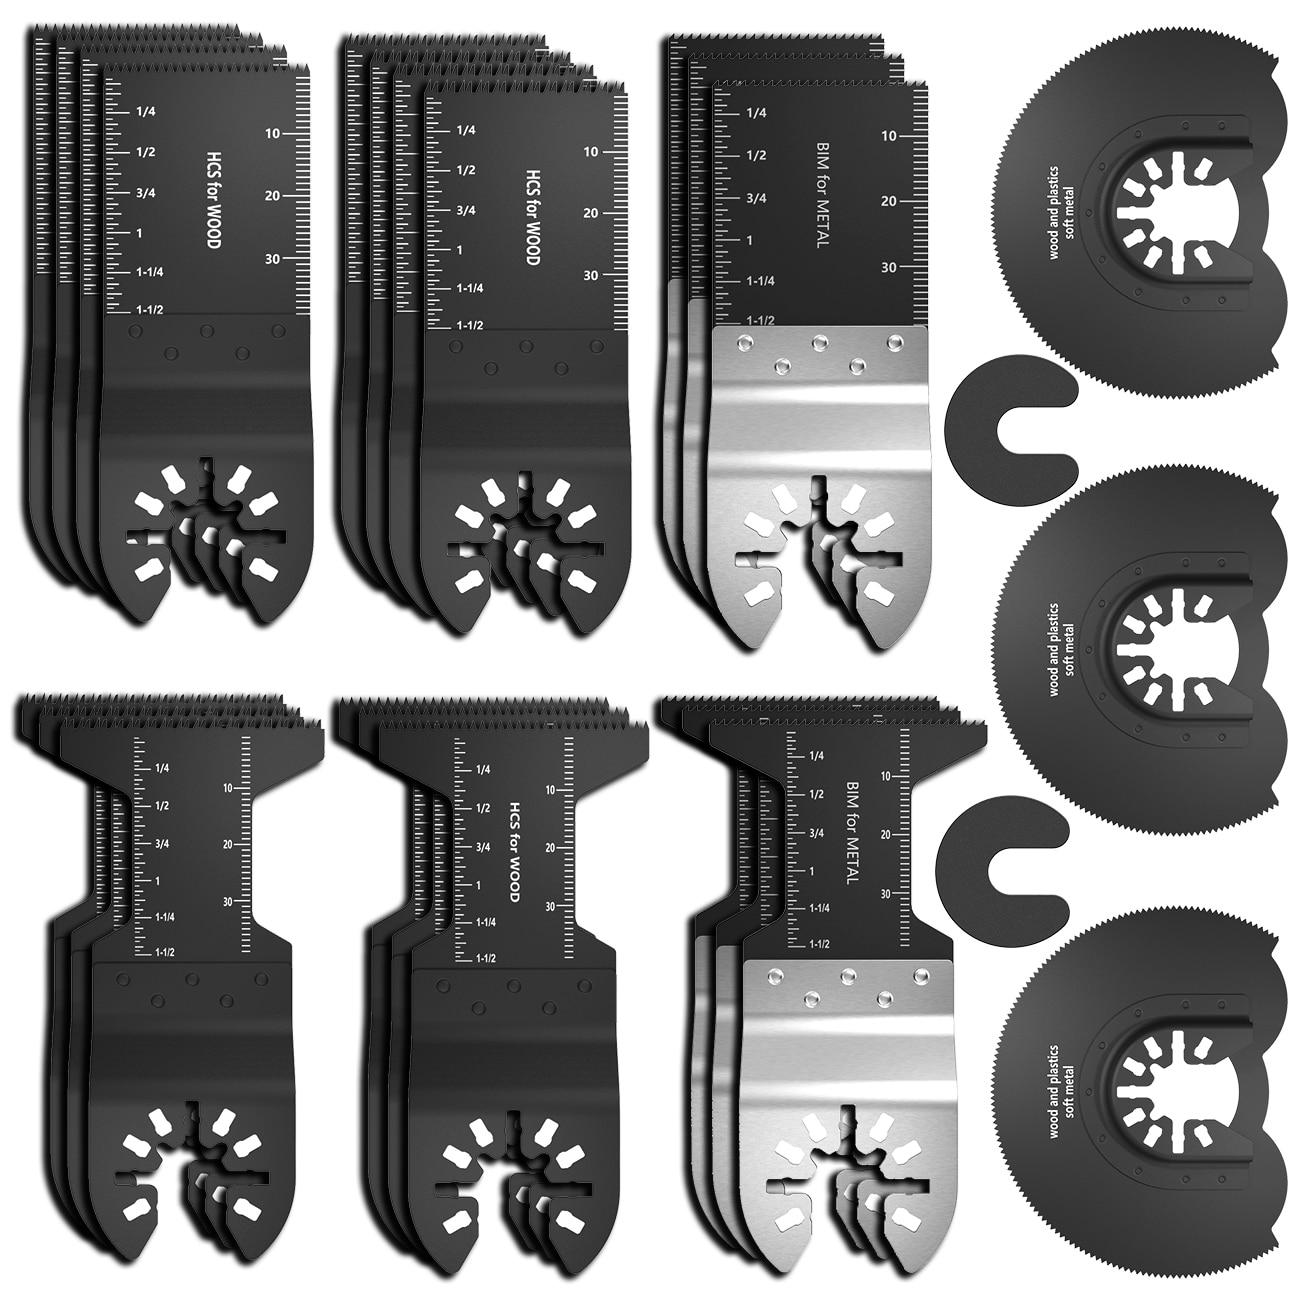 Popular 25 Pcs Oscillating Tool Saw Blades Electric Tools Accessories